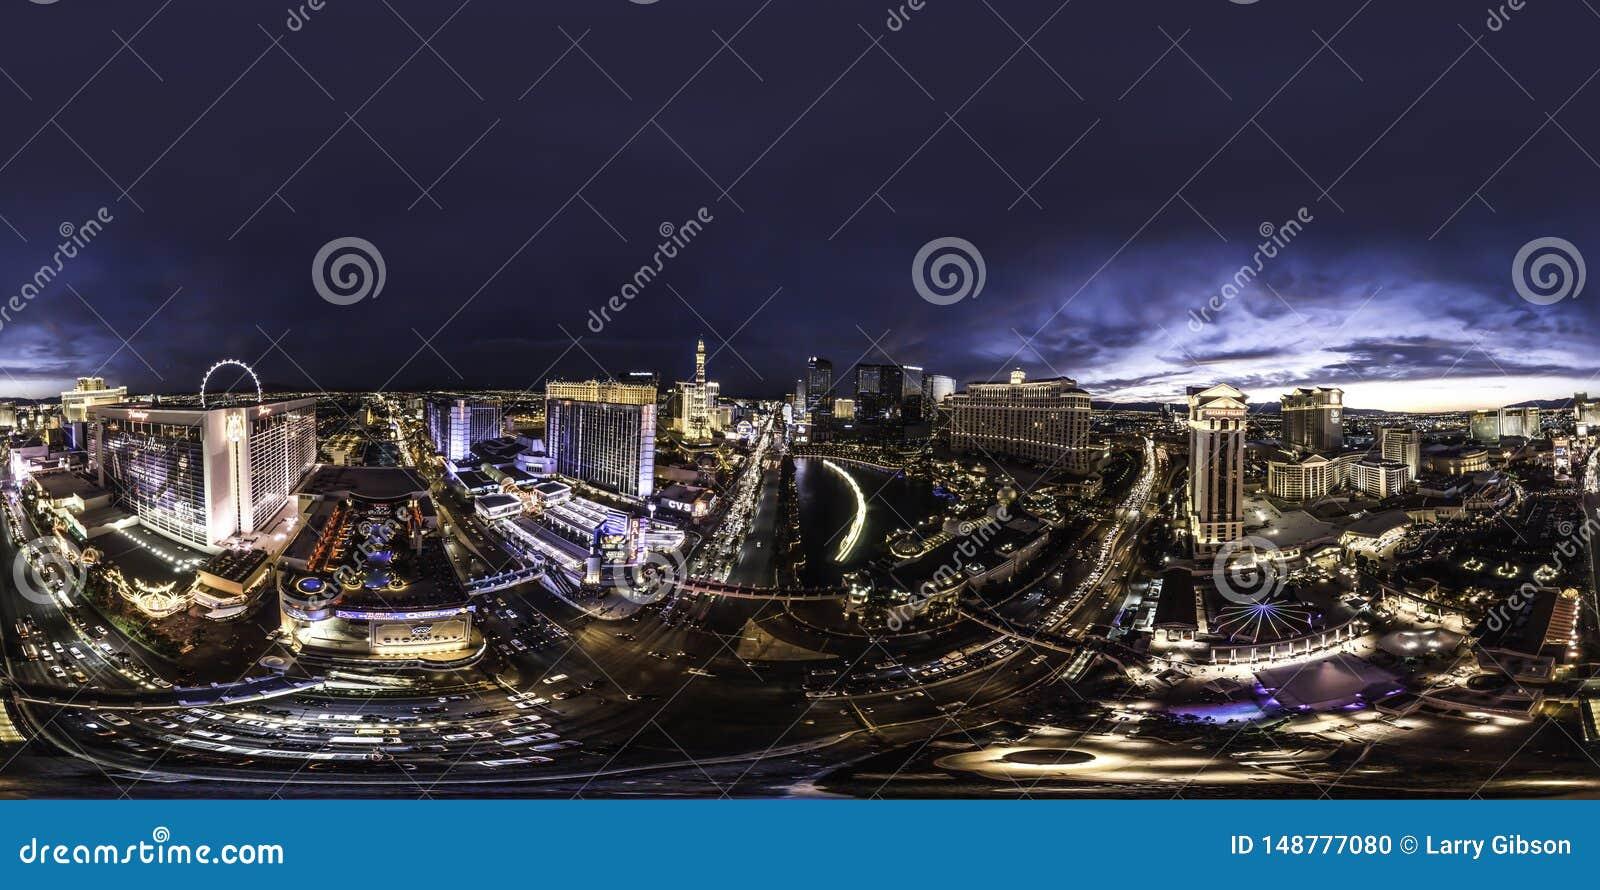 A night view of downtown Las Vegas the strip